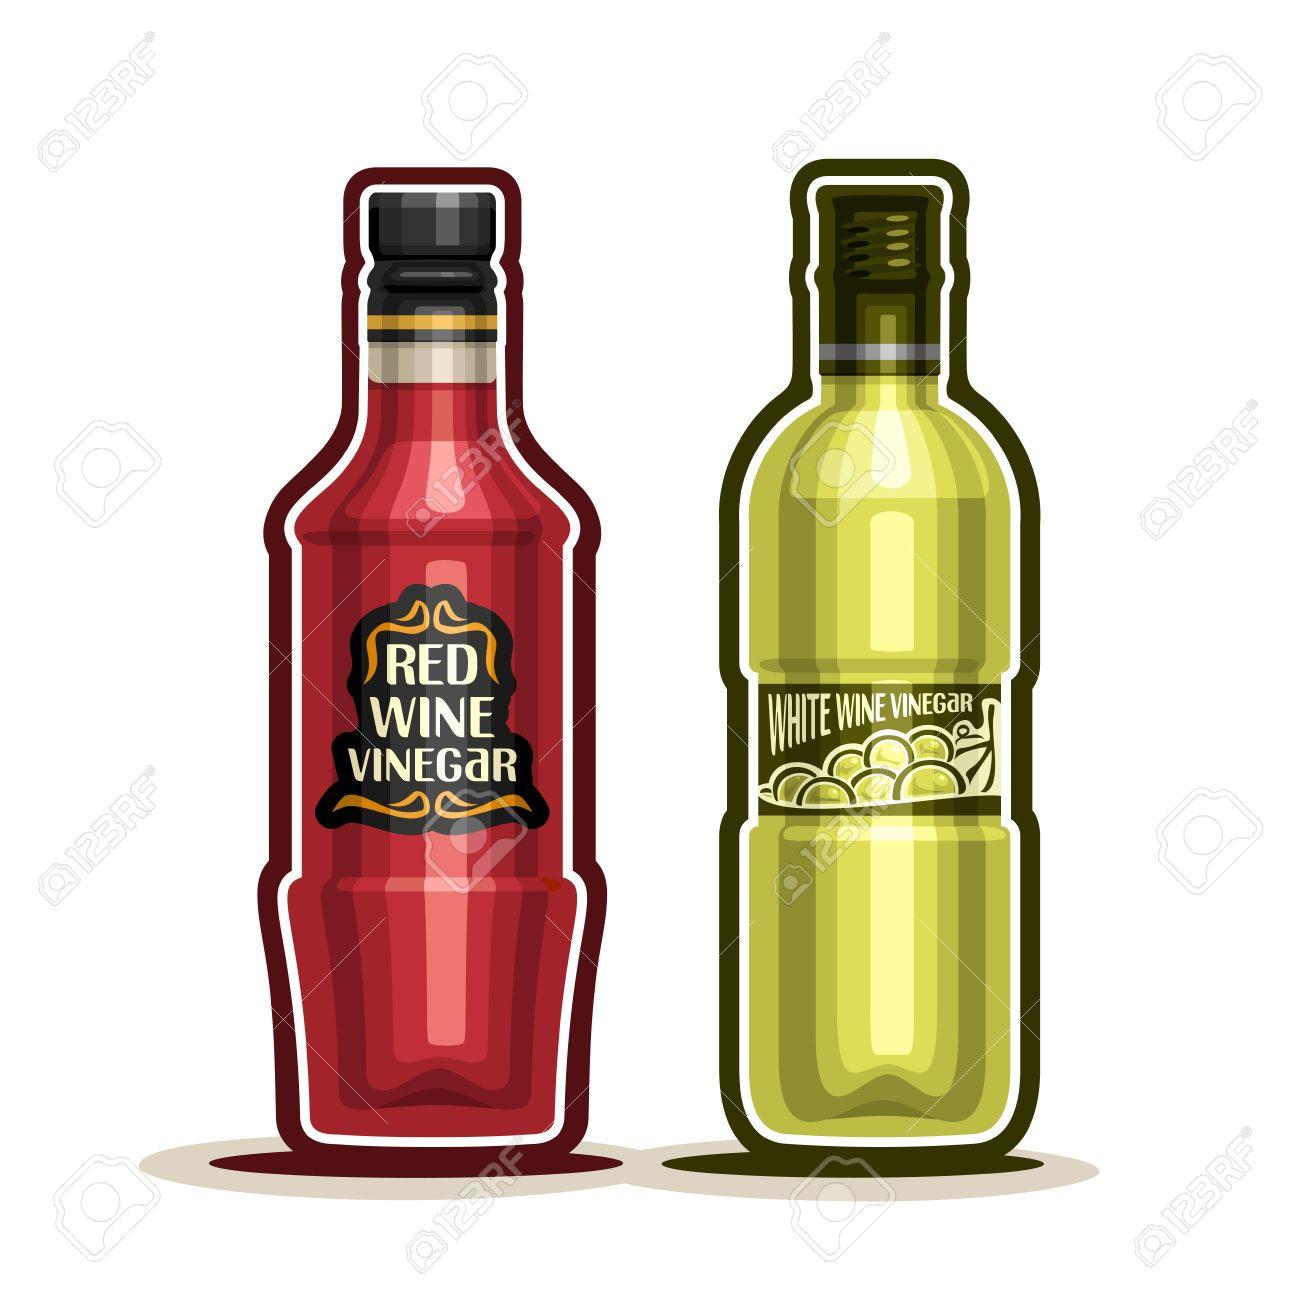 White Vinegar Vswhite Wine Vinegar The Instapaper